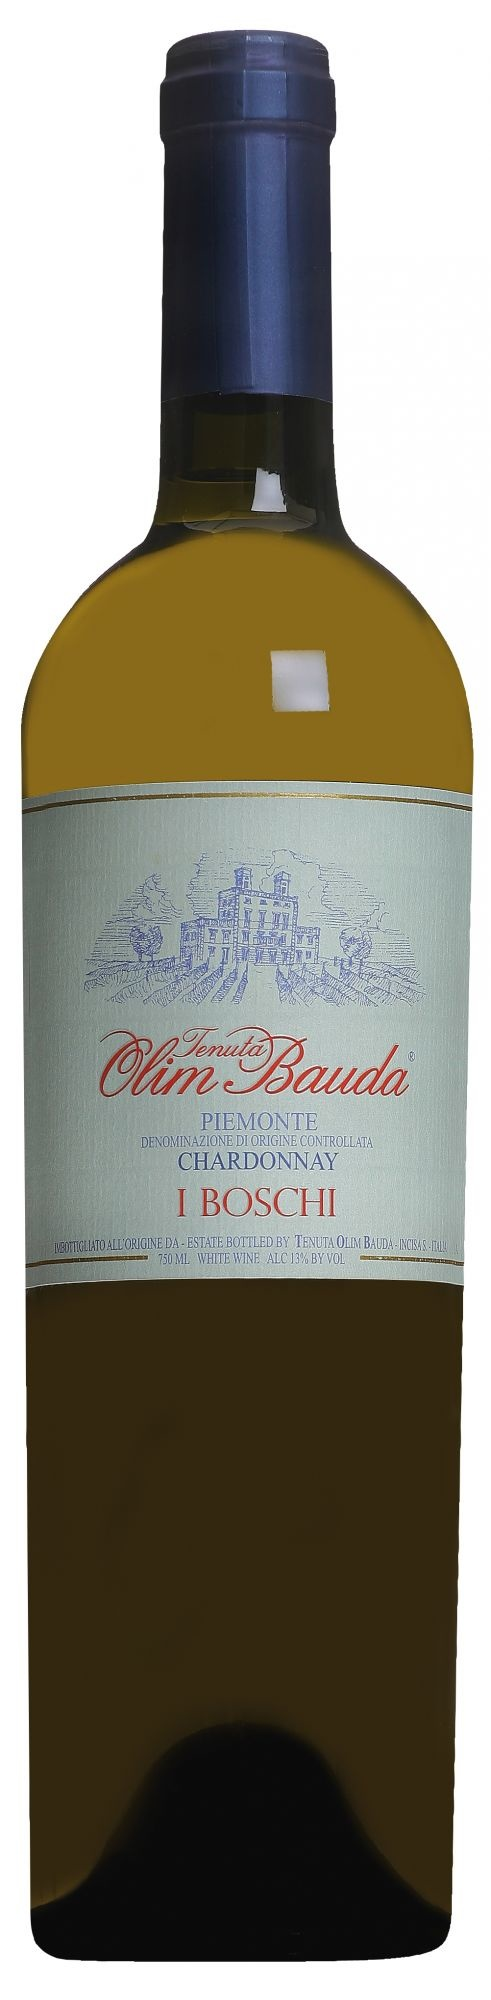 Olim Bauda Tenuta Olim Bauda Piemonte Chardonnay I Boschi 2019